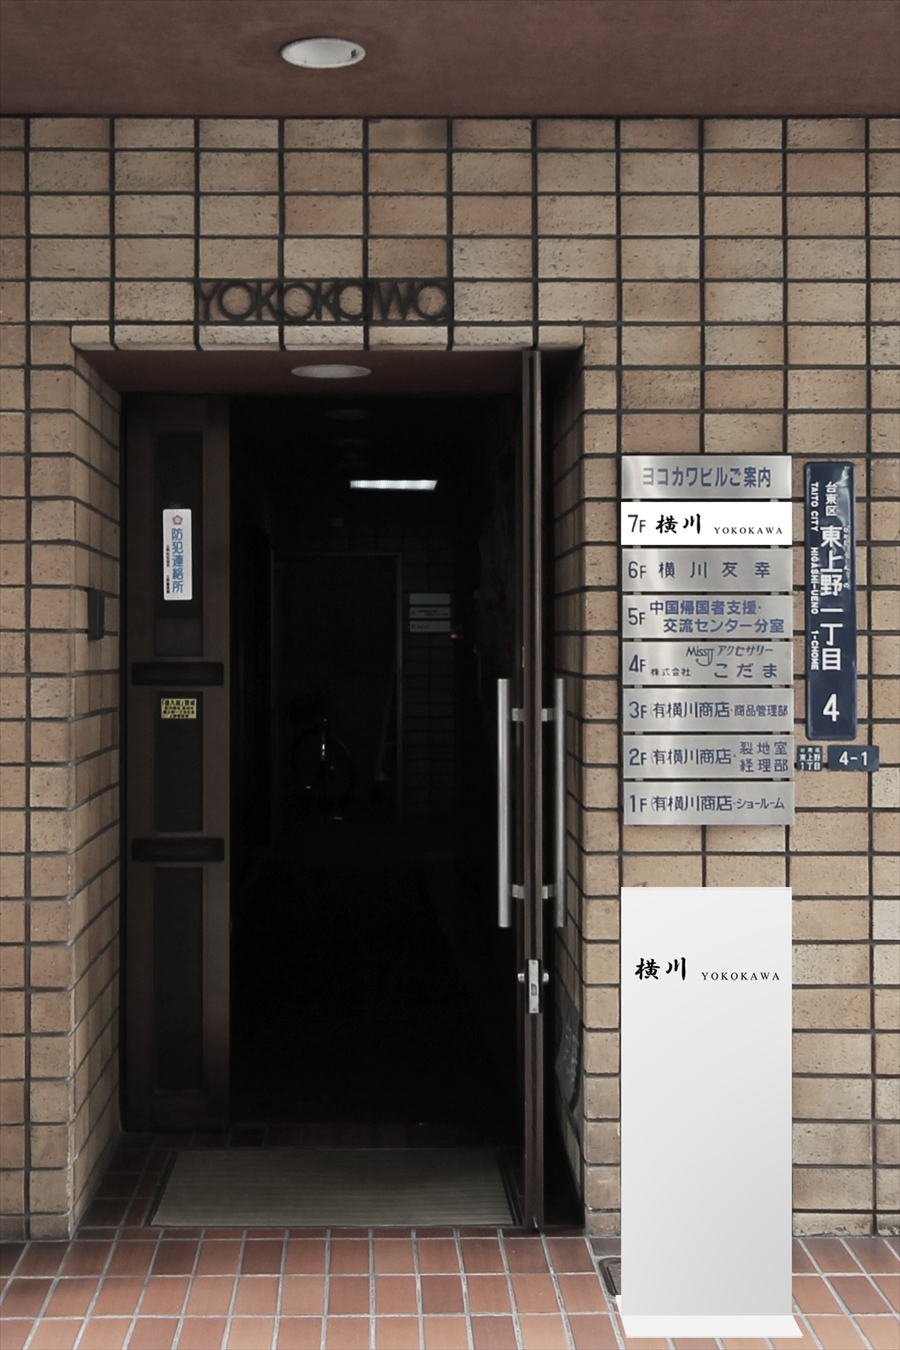 Yokokawa On Behance